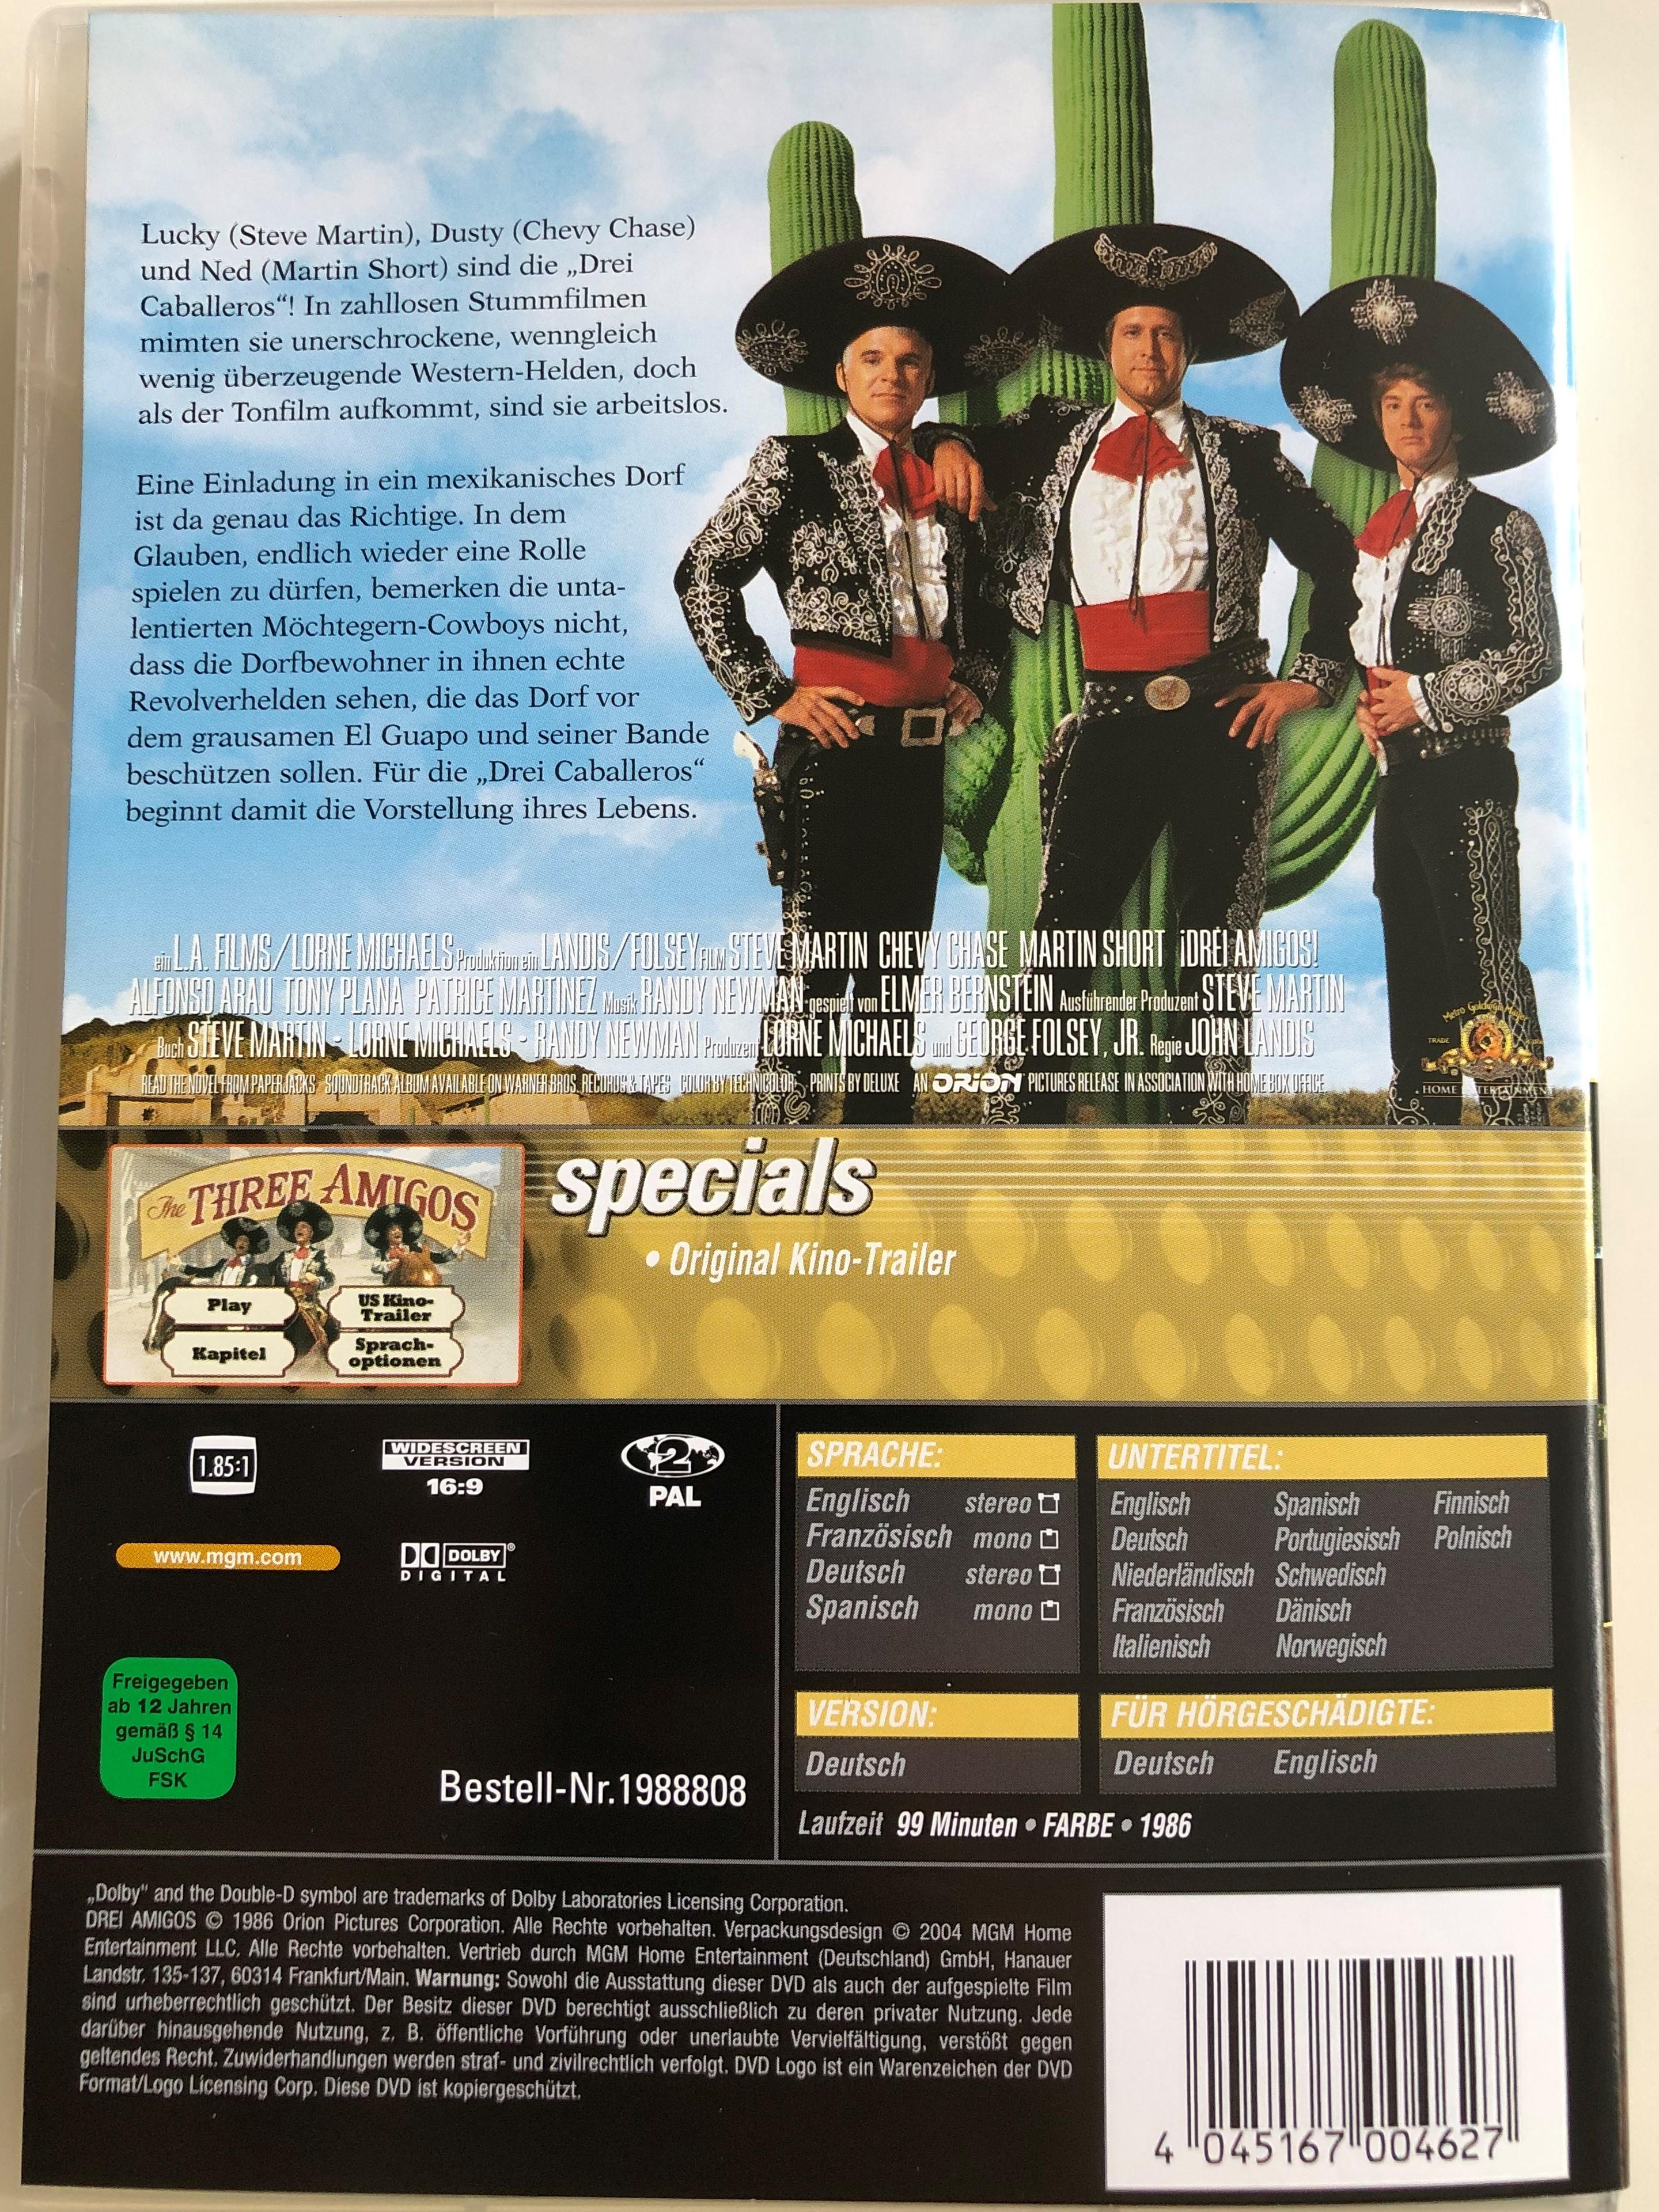 the-three-amigos-dvd-1986-drei-amigos-directed-by-john-landis-starring-steve-martin-chevy-chase-martin-short-alfonso-arau-2-.jpg